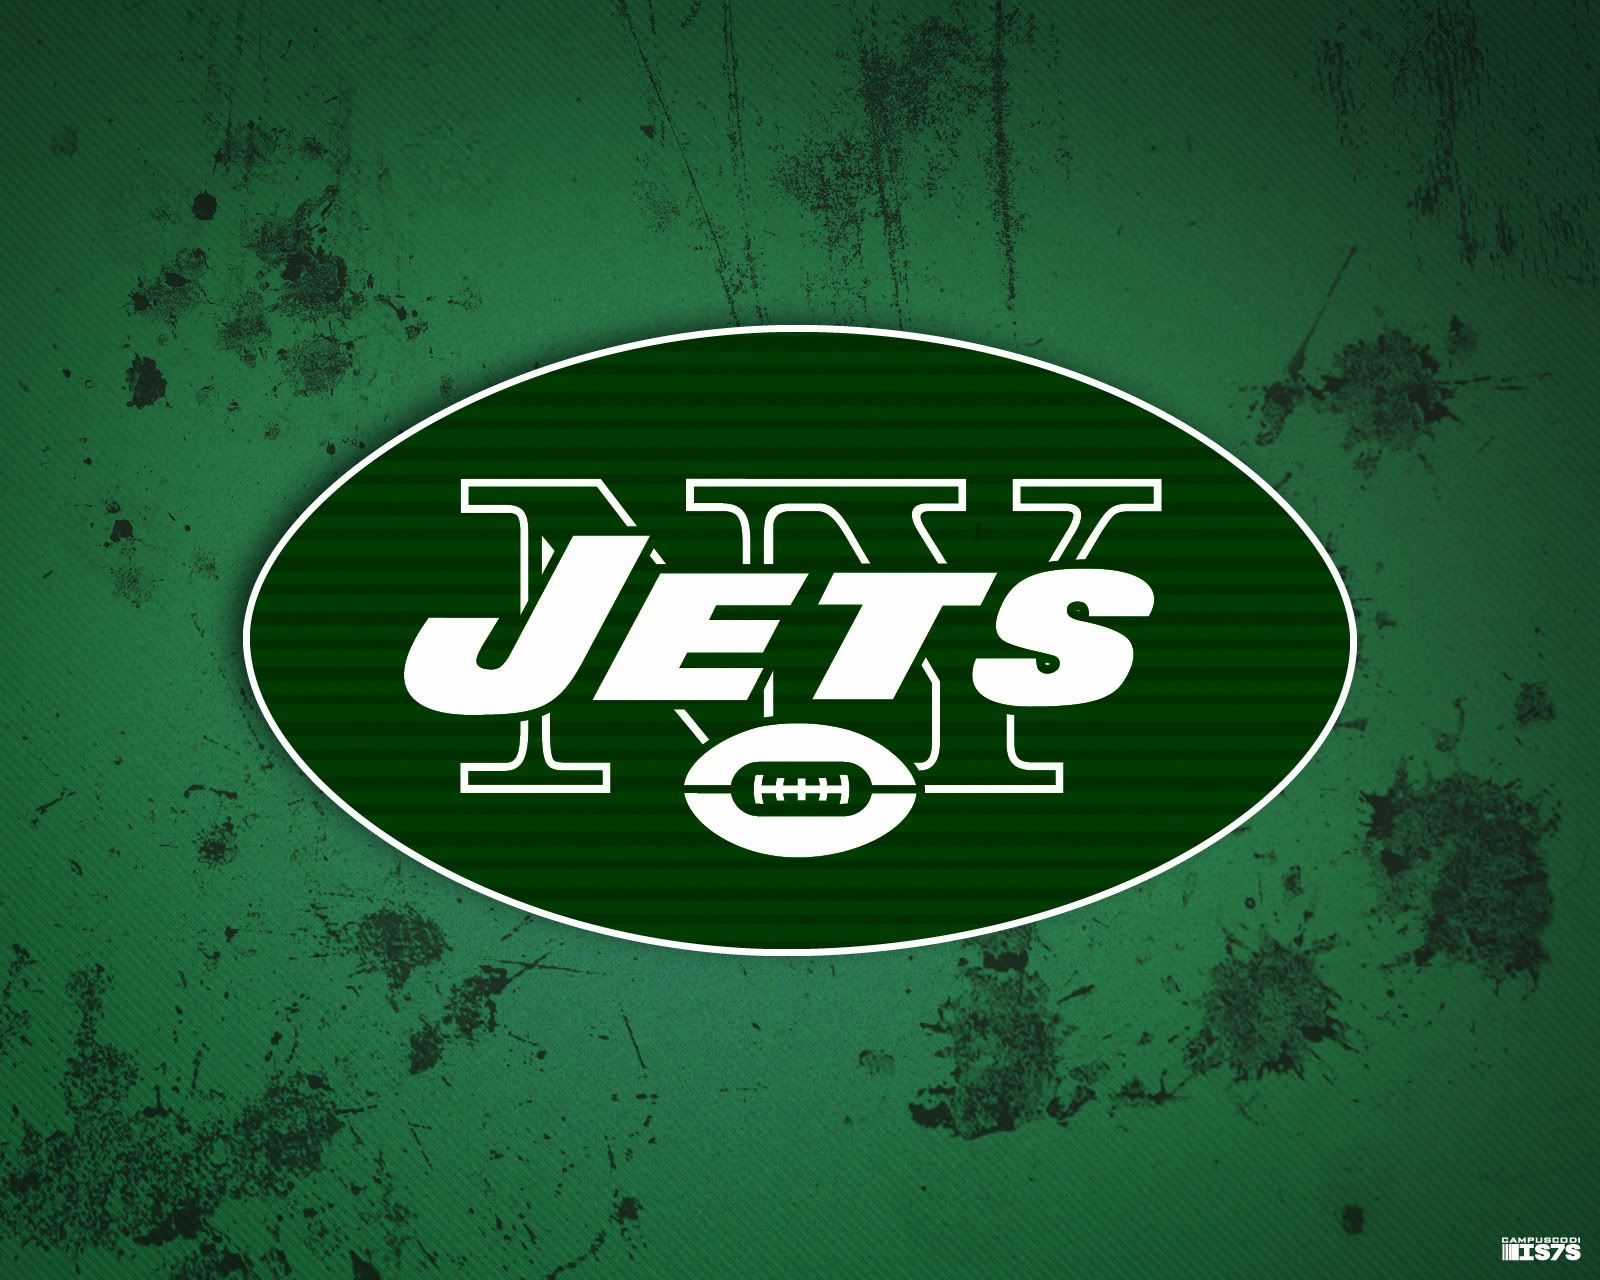 New York Jets Logo Nfl Wallpaper Hd New York Jets Nfl Football